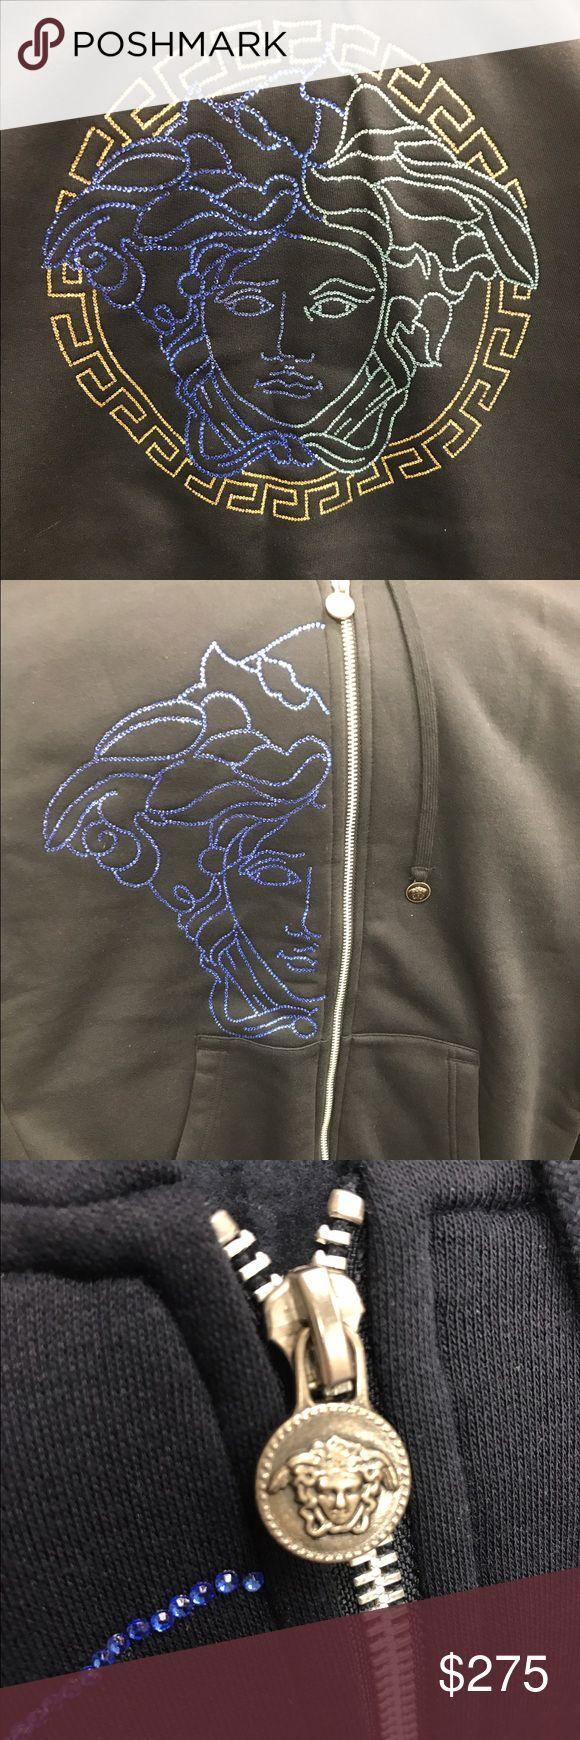 Custom Versace Hoodie Ask for details - XL Jackets & Coats Blazers